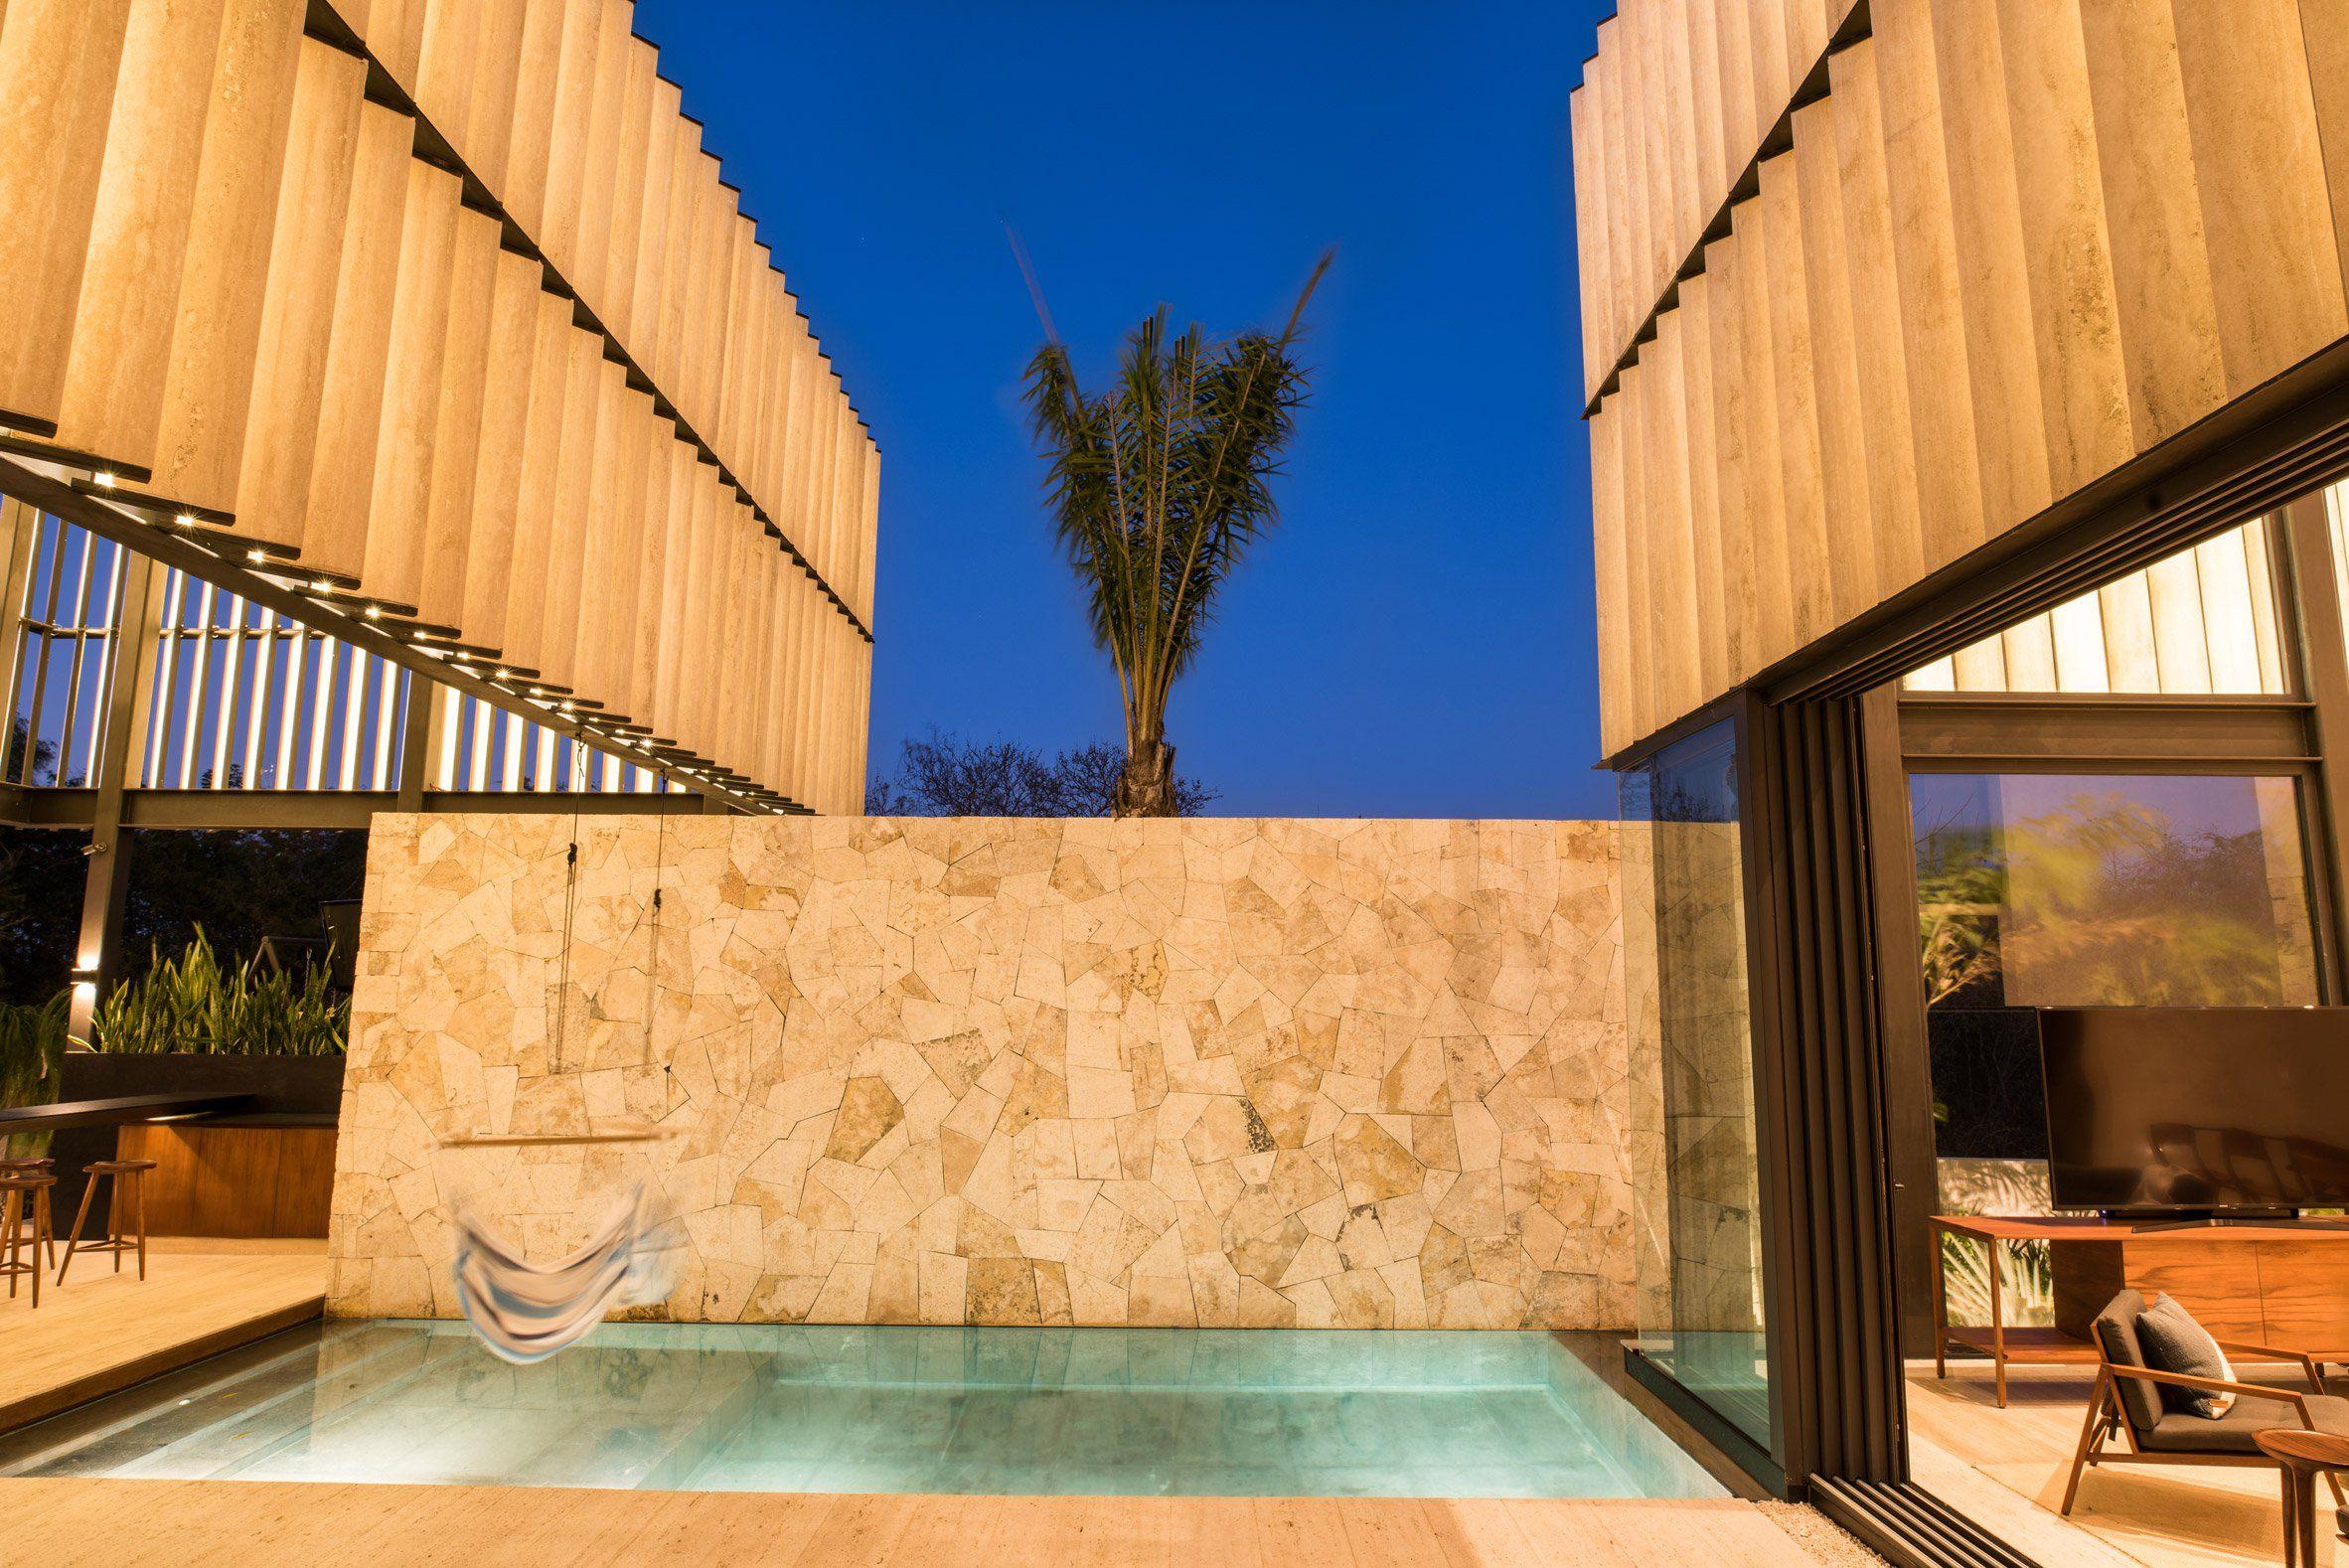 Luxe Droomtuin Mexico : Luxe droomtuin uit mexico tuin mexico luxe en tuin